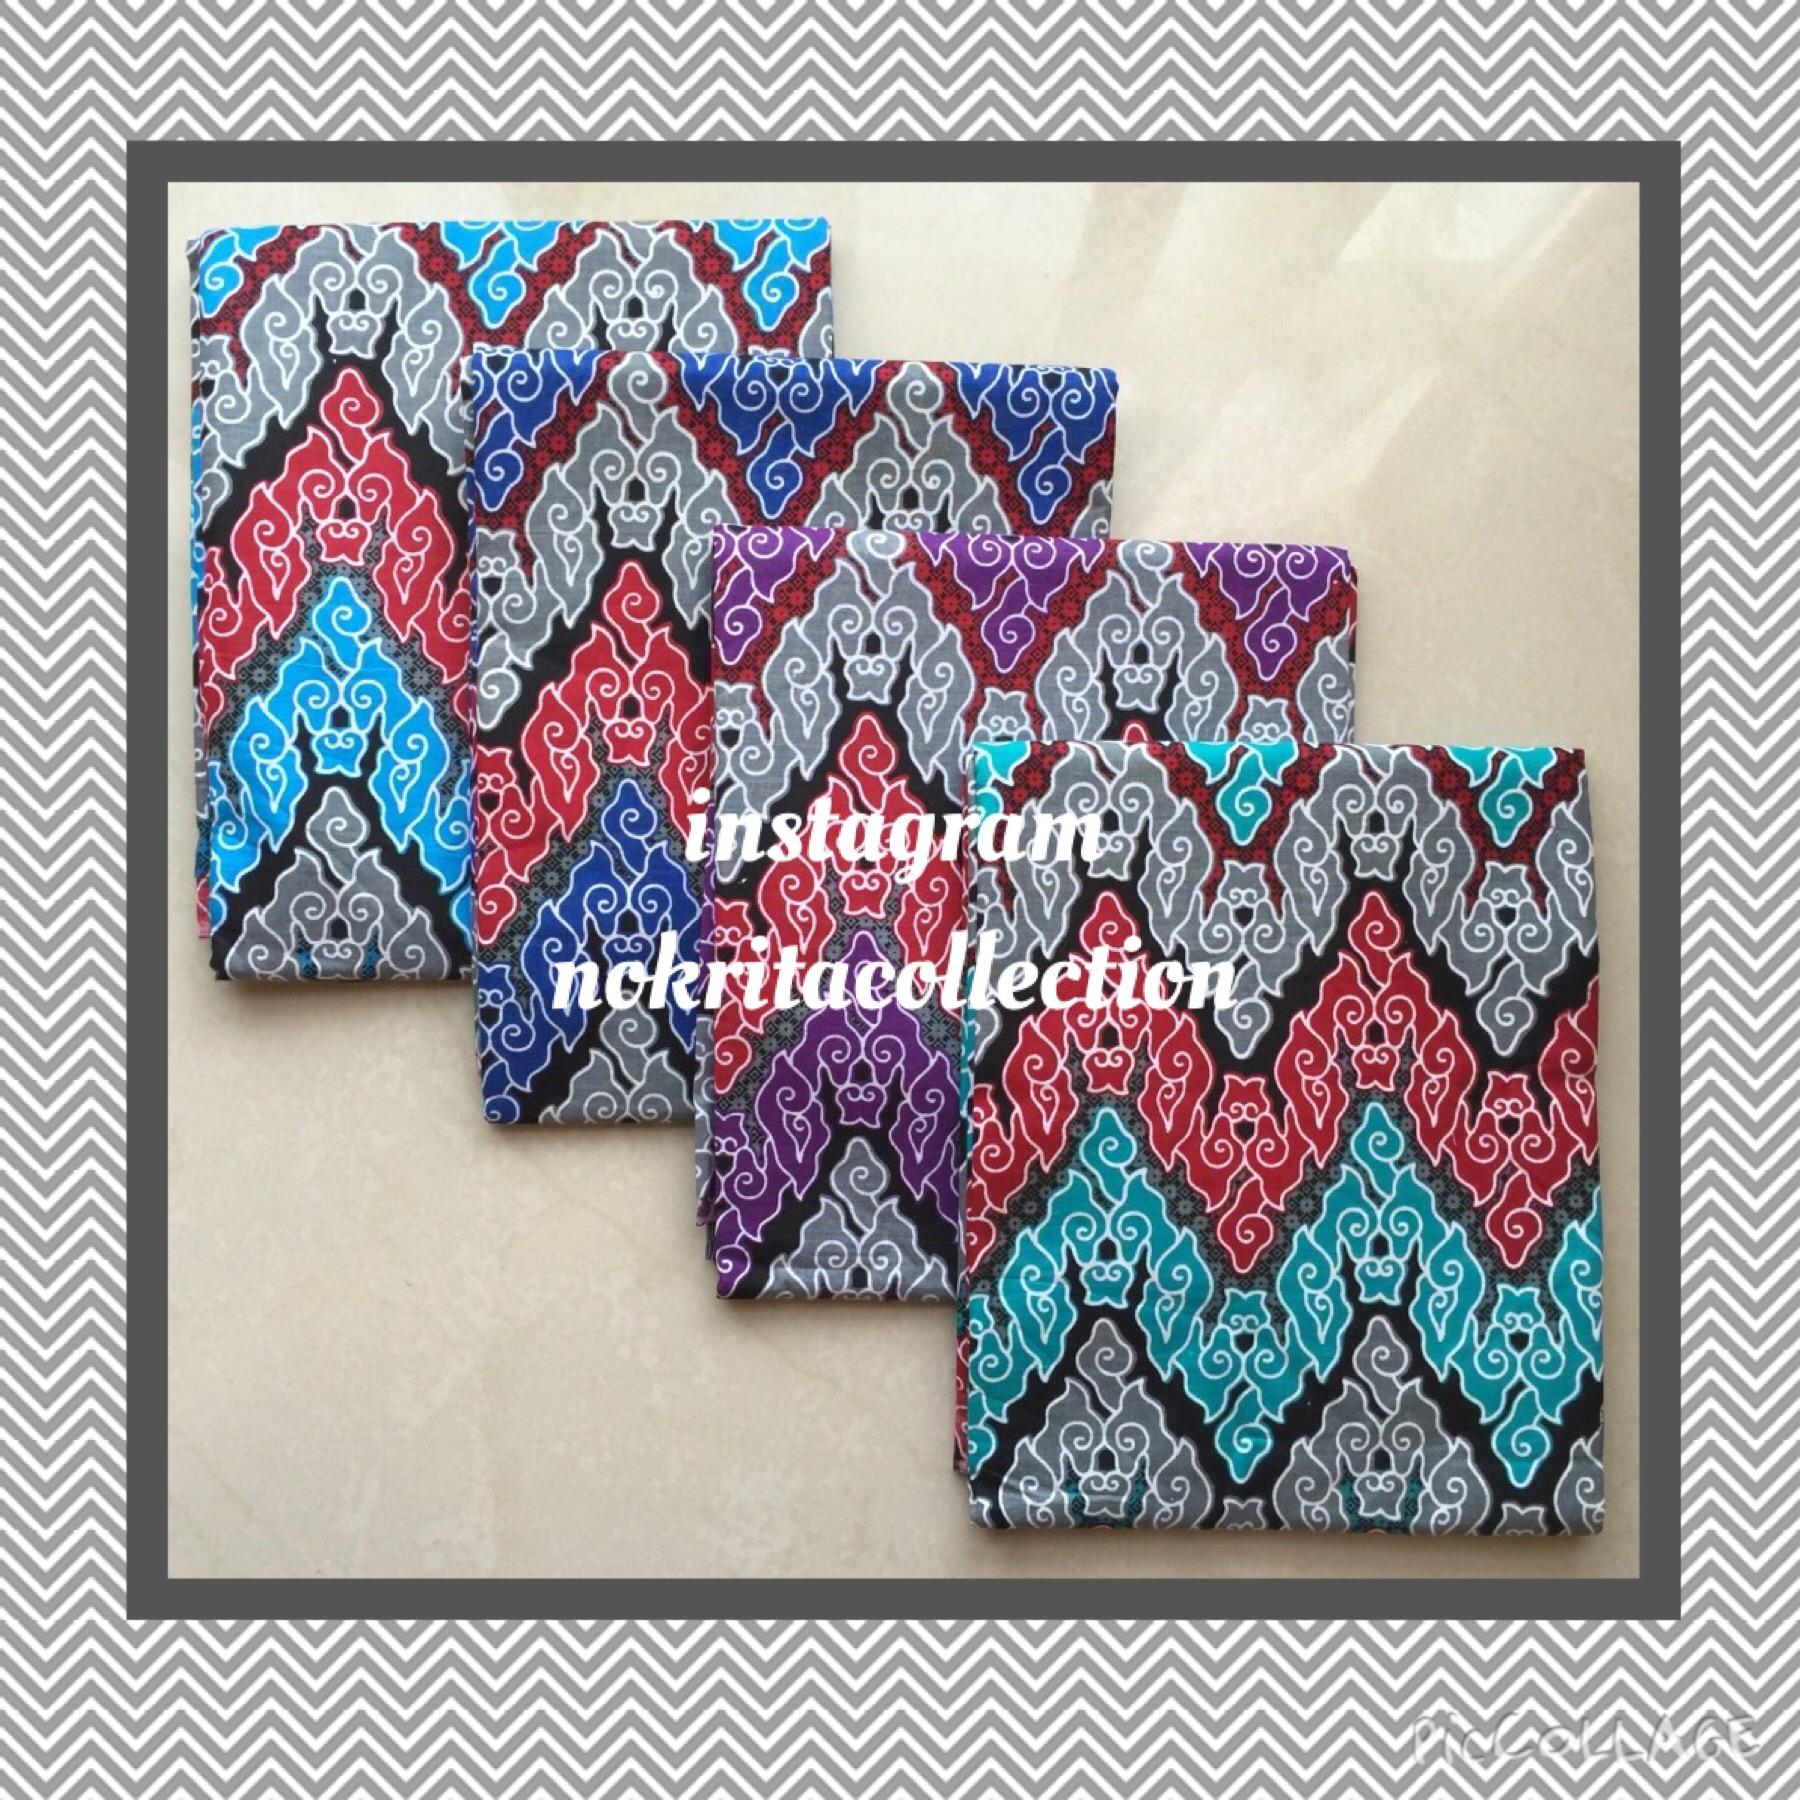 Jual Kain Batik Rang Rang Motif Mega Mendung Printing